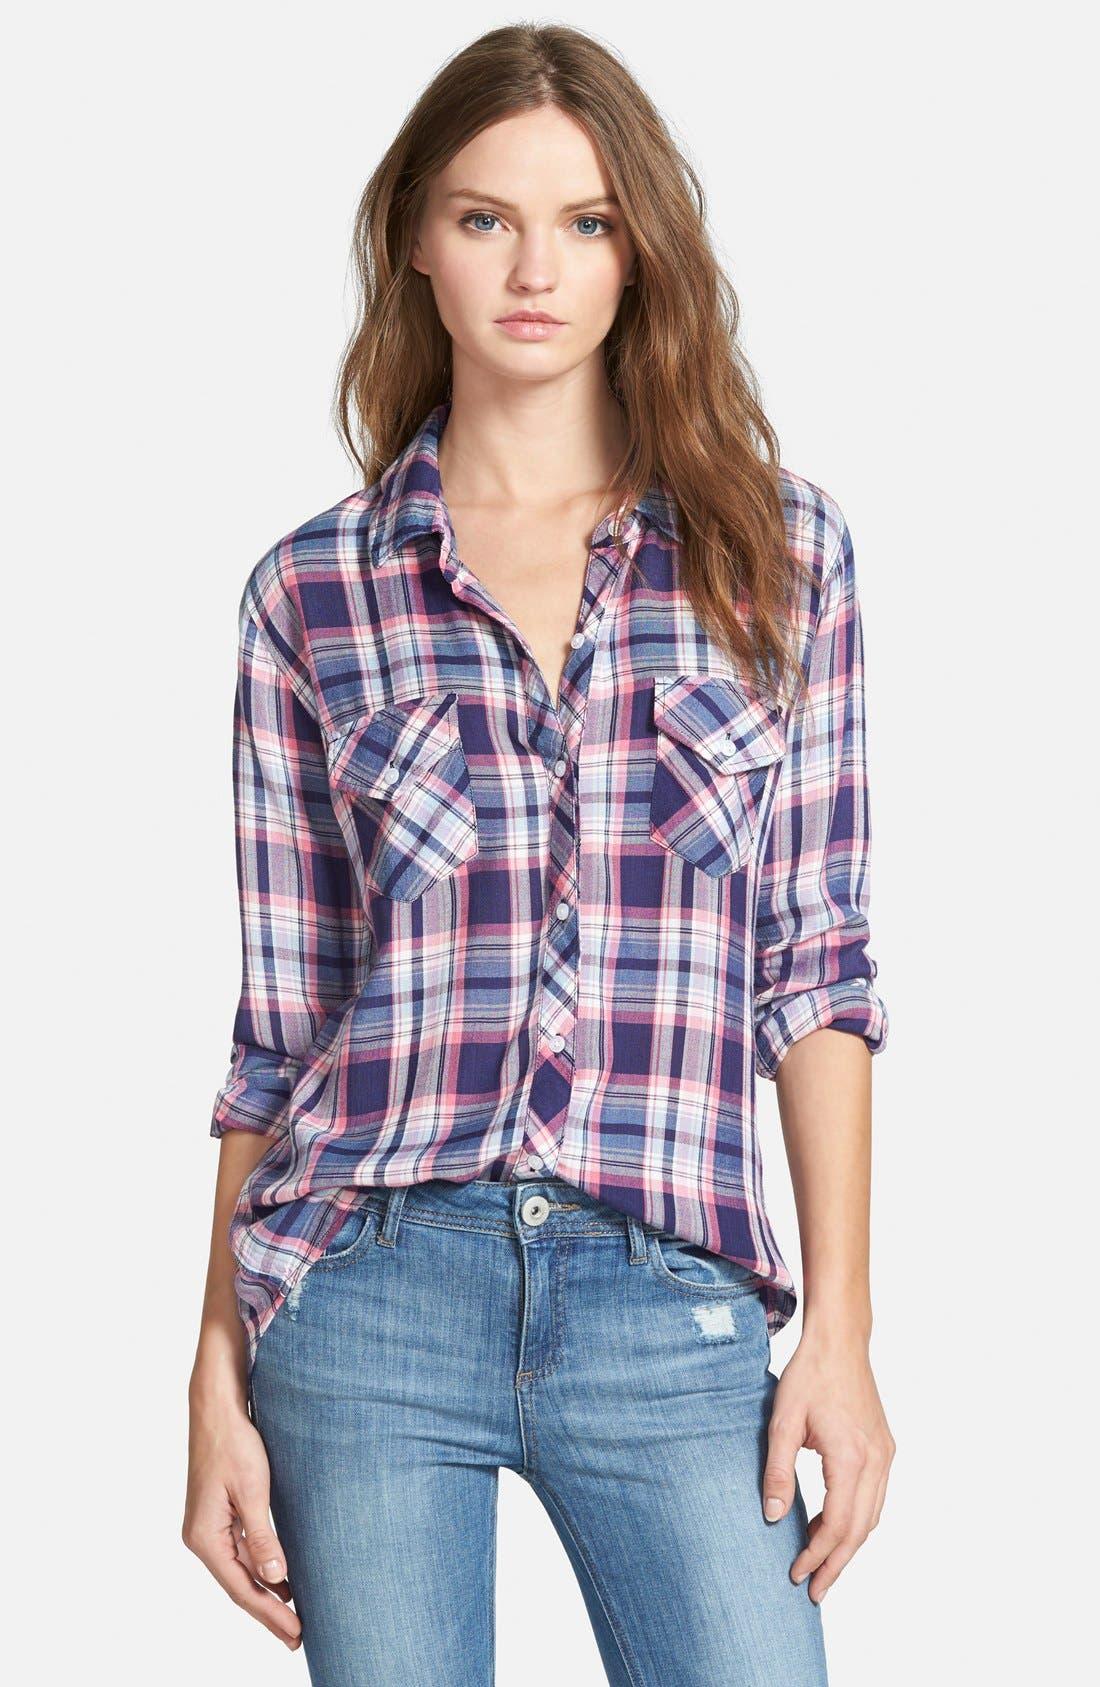 Alternate Image 1 Selected - Rails 'Carmen' Plaid Shirt